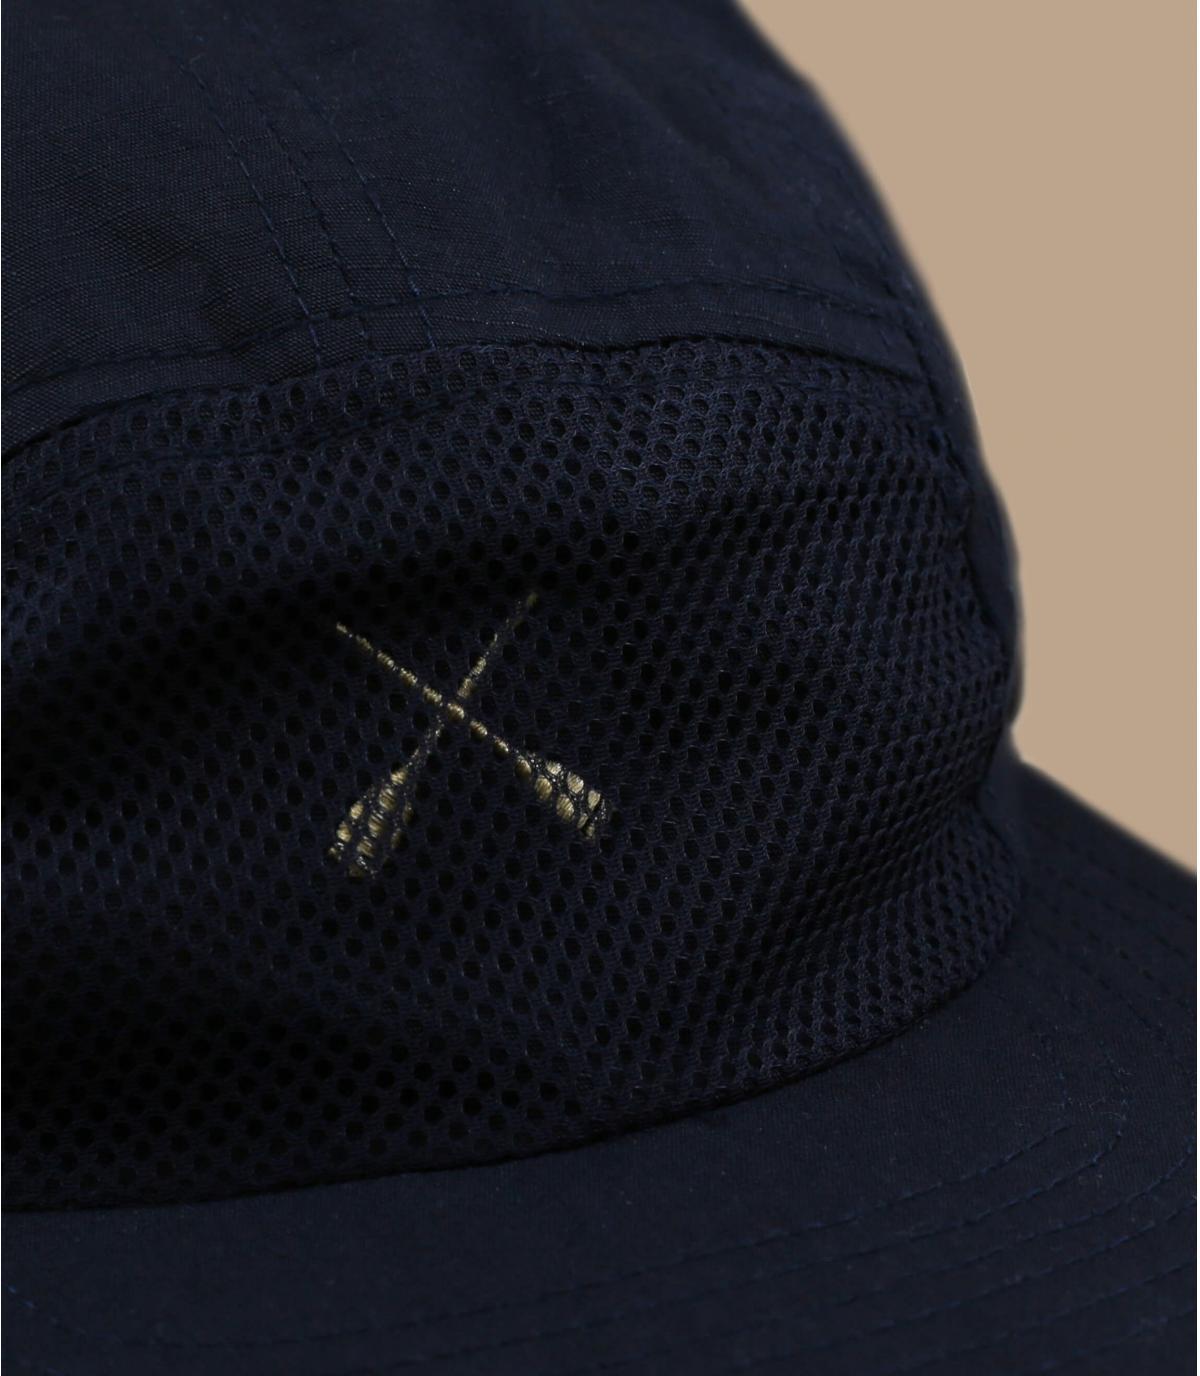 gorra 5 panel azul marino